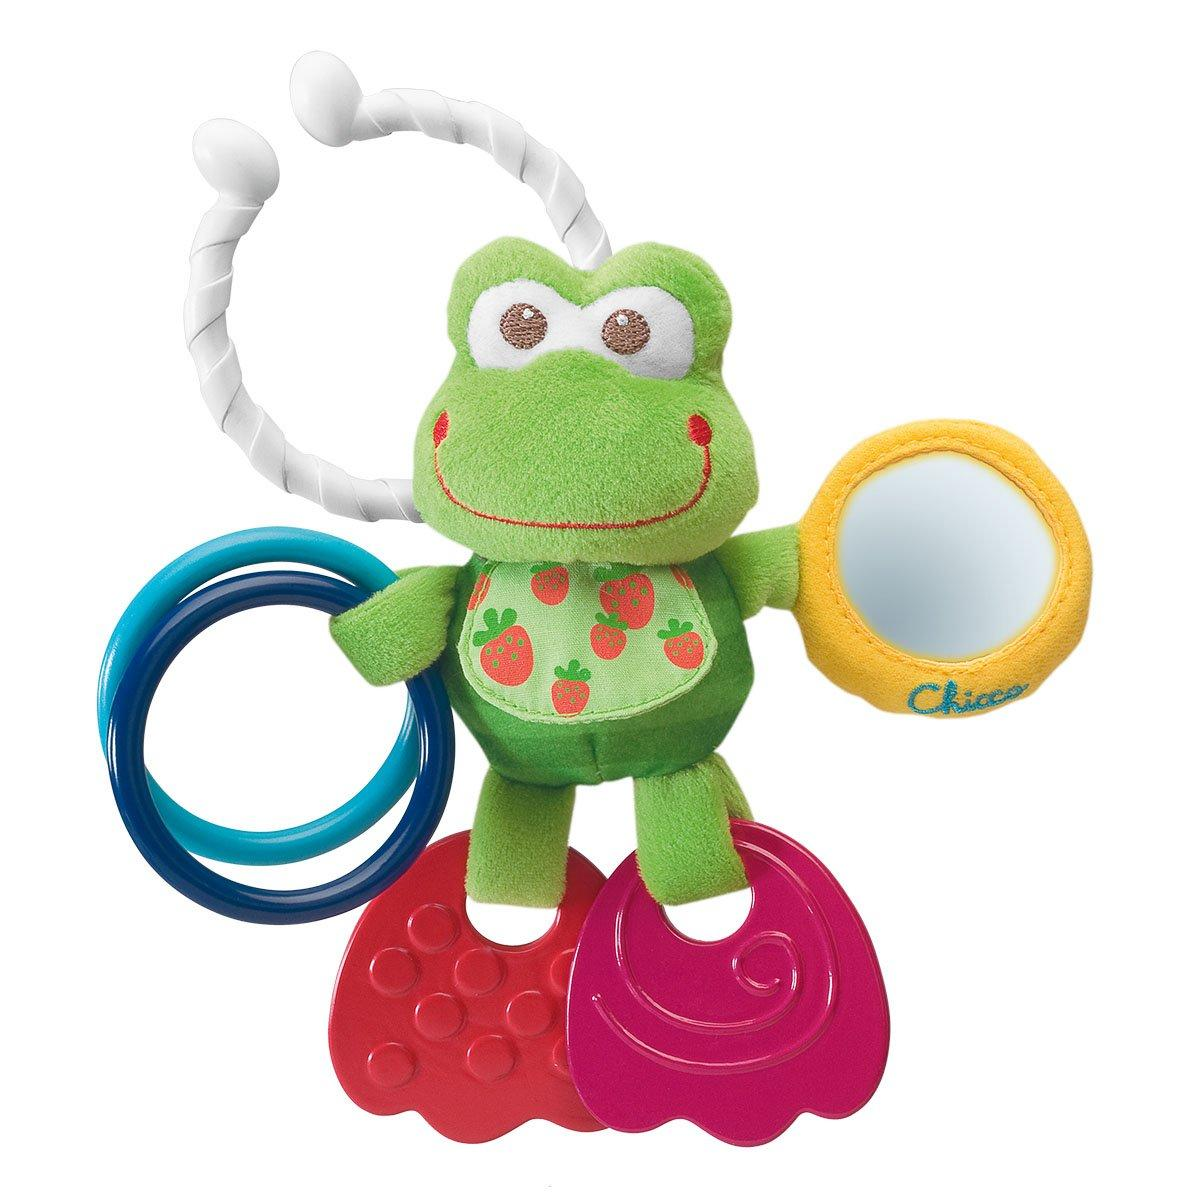 Іграшка-брязкальце Chicco Жабка